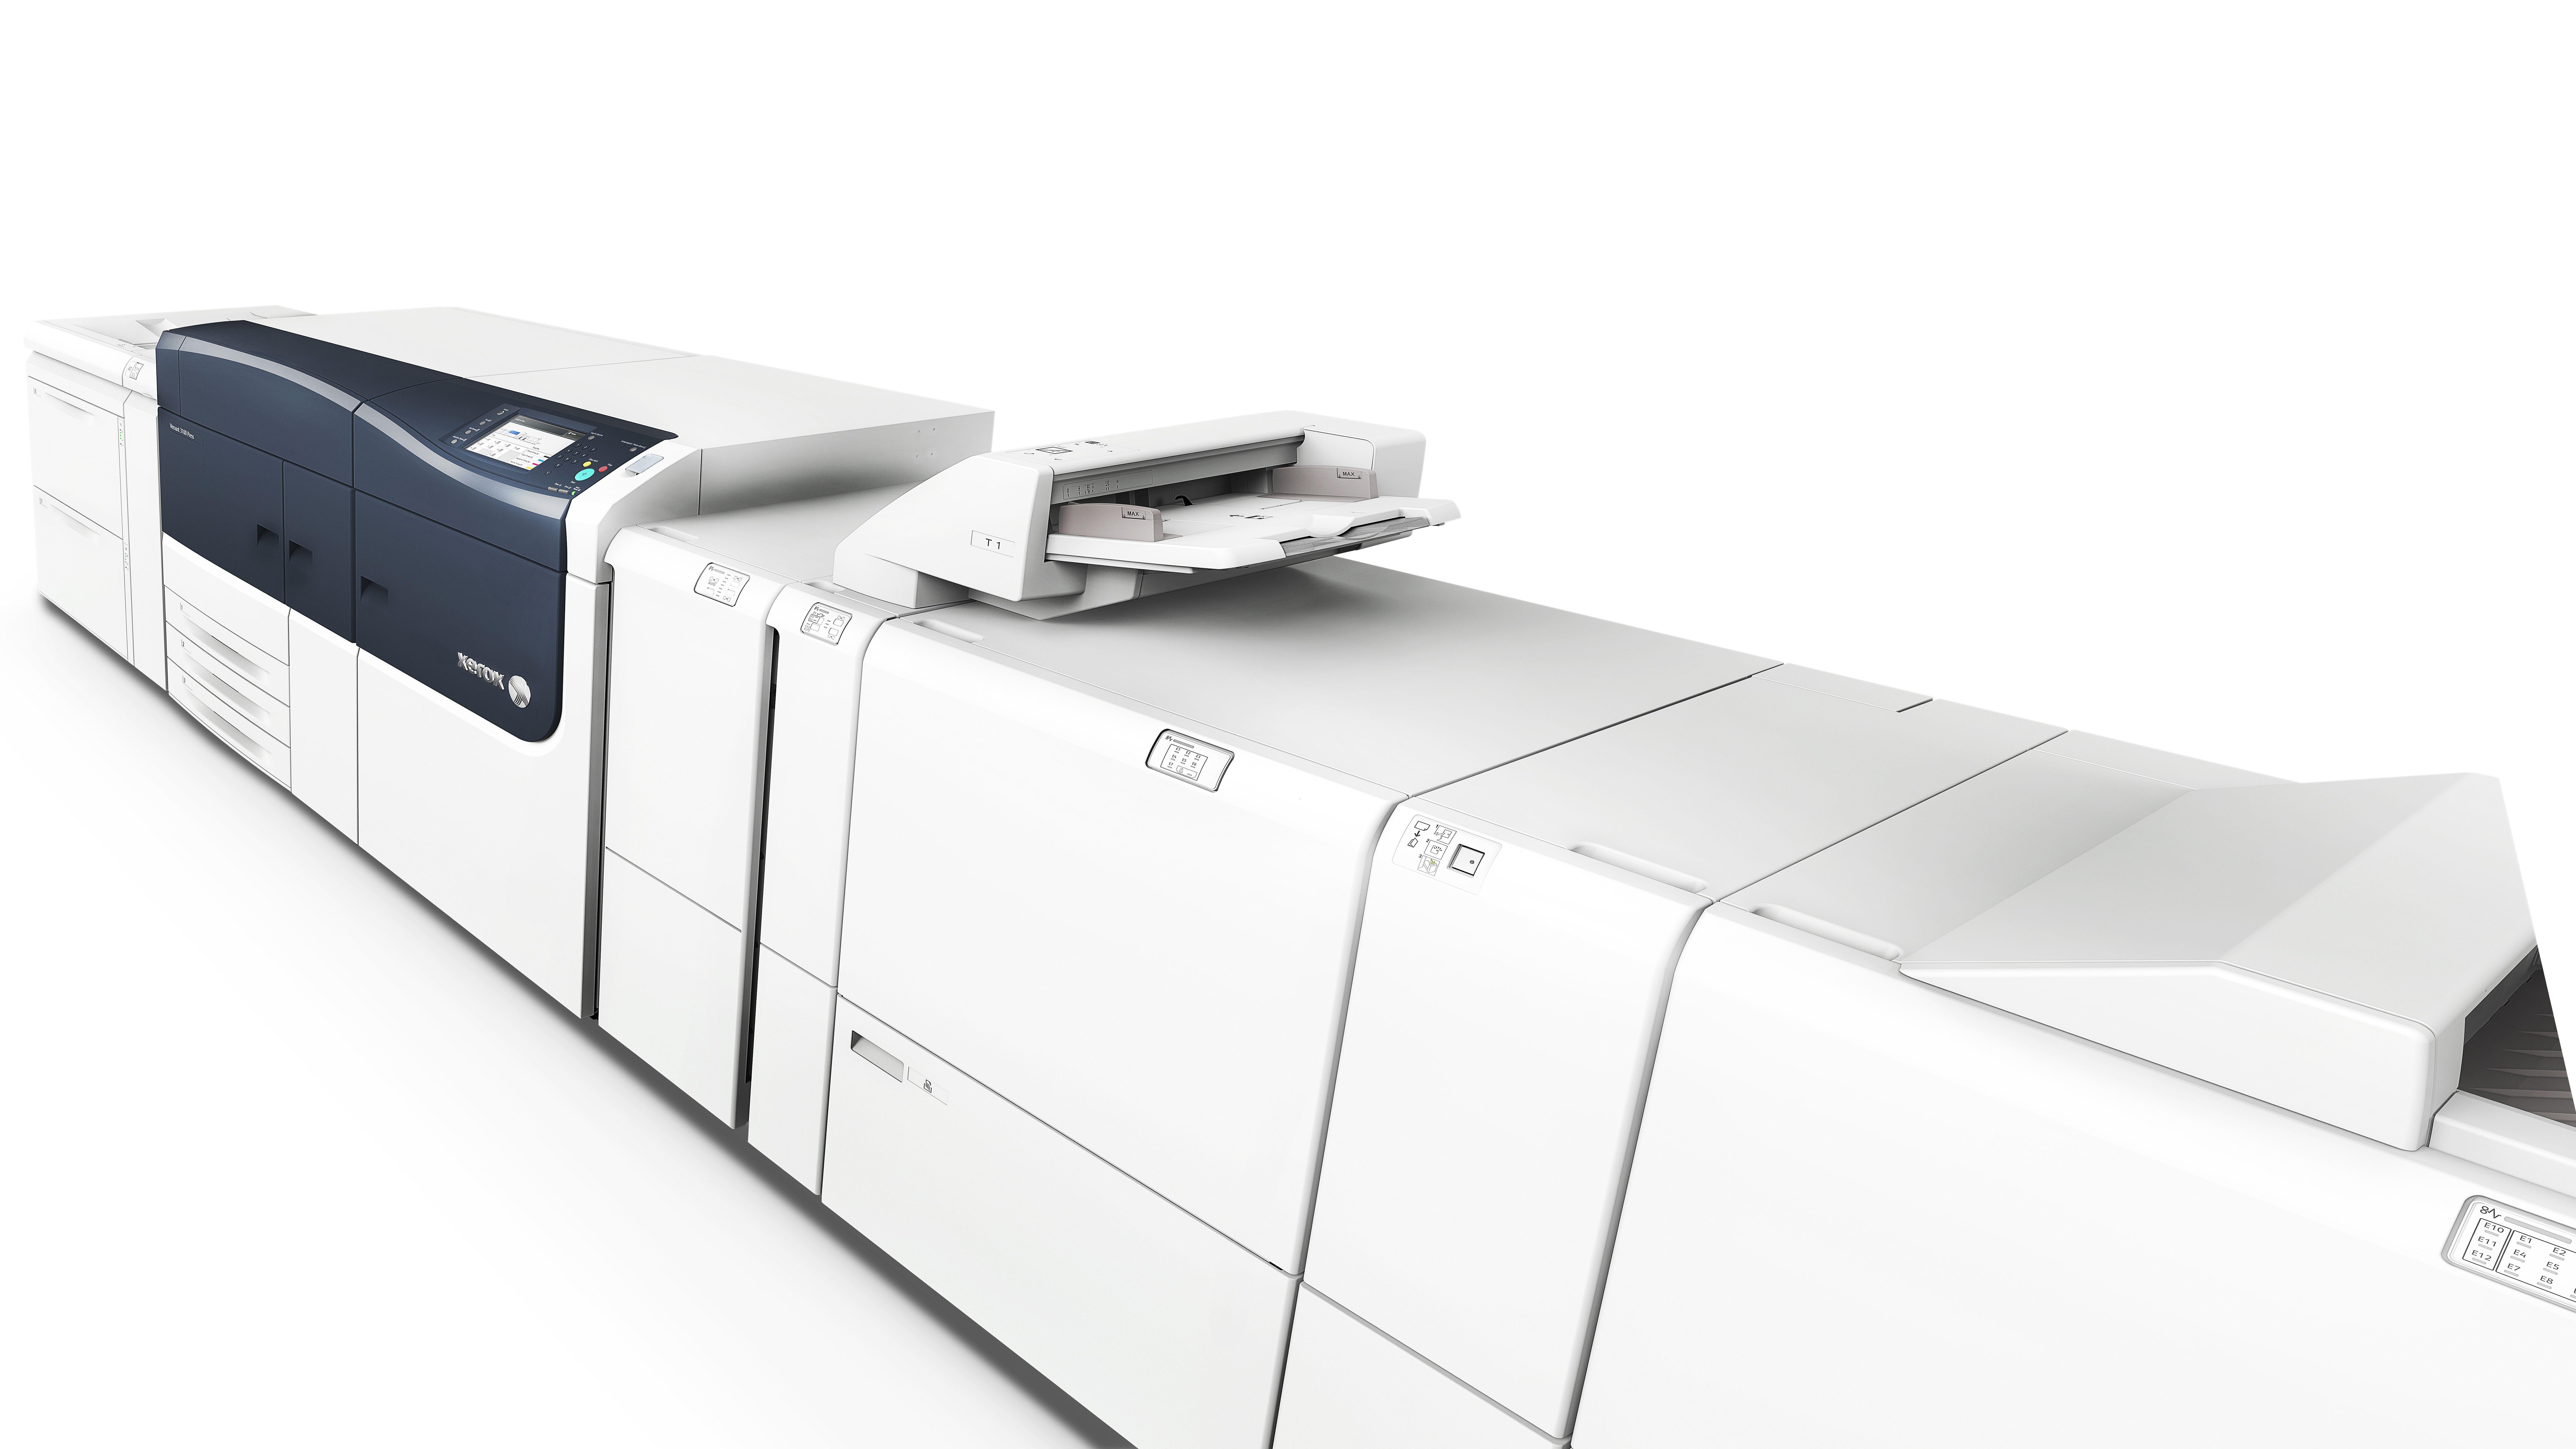 Xerox Versant 3100 Press Office Prints Banner Printing Color